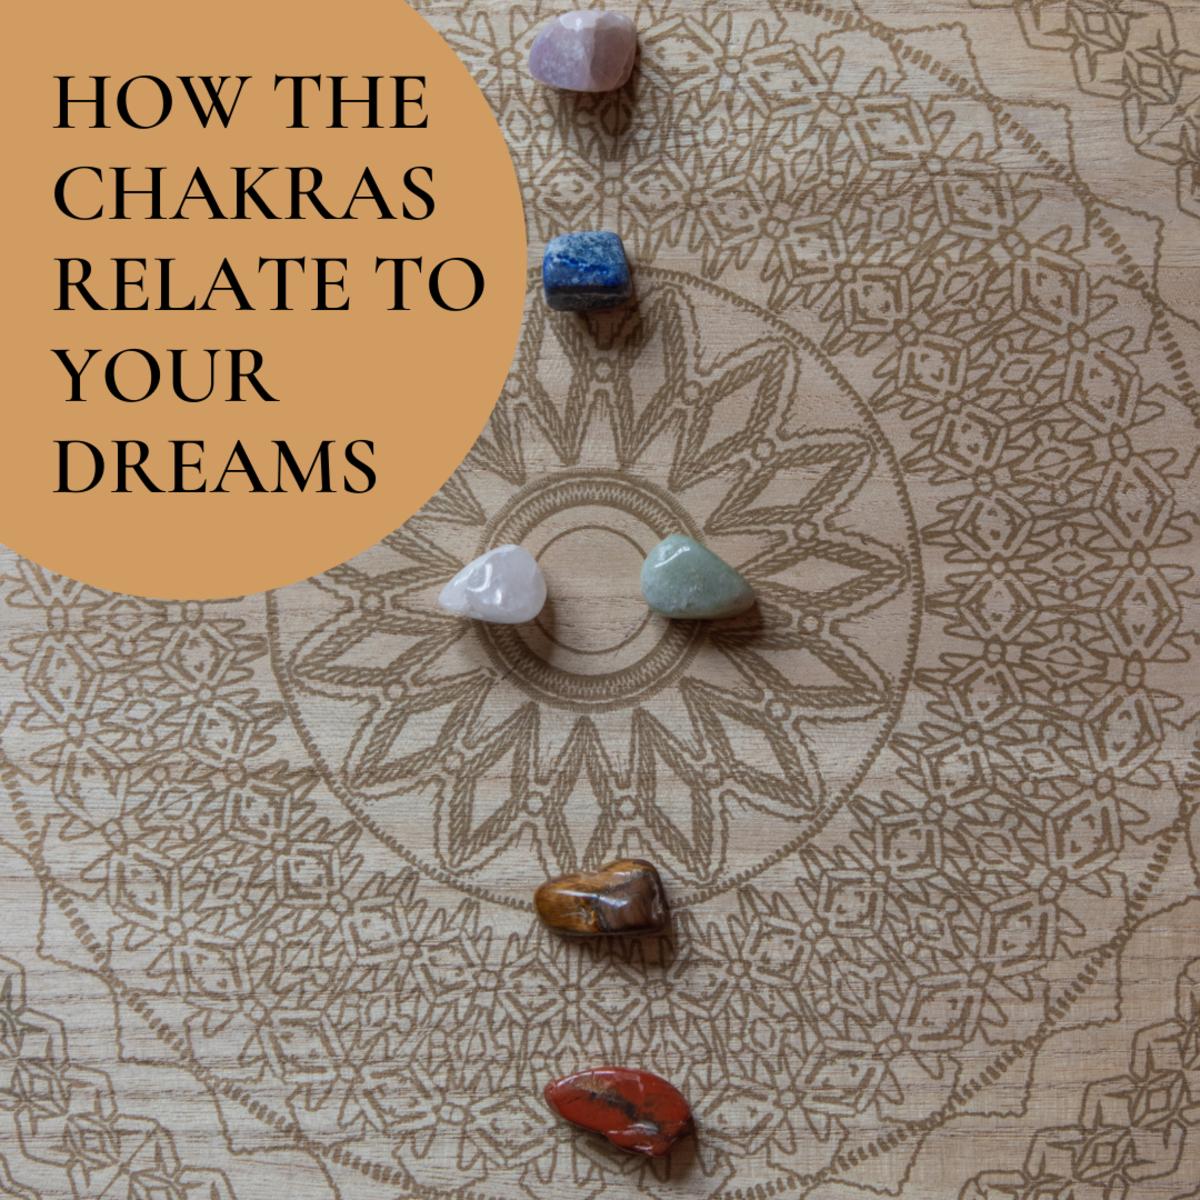 How to Use Chakras in Dream Interpretation